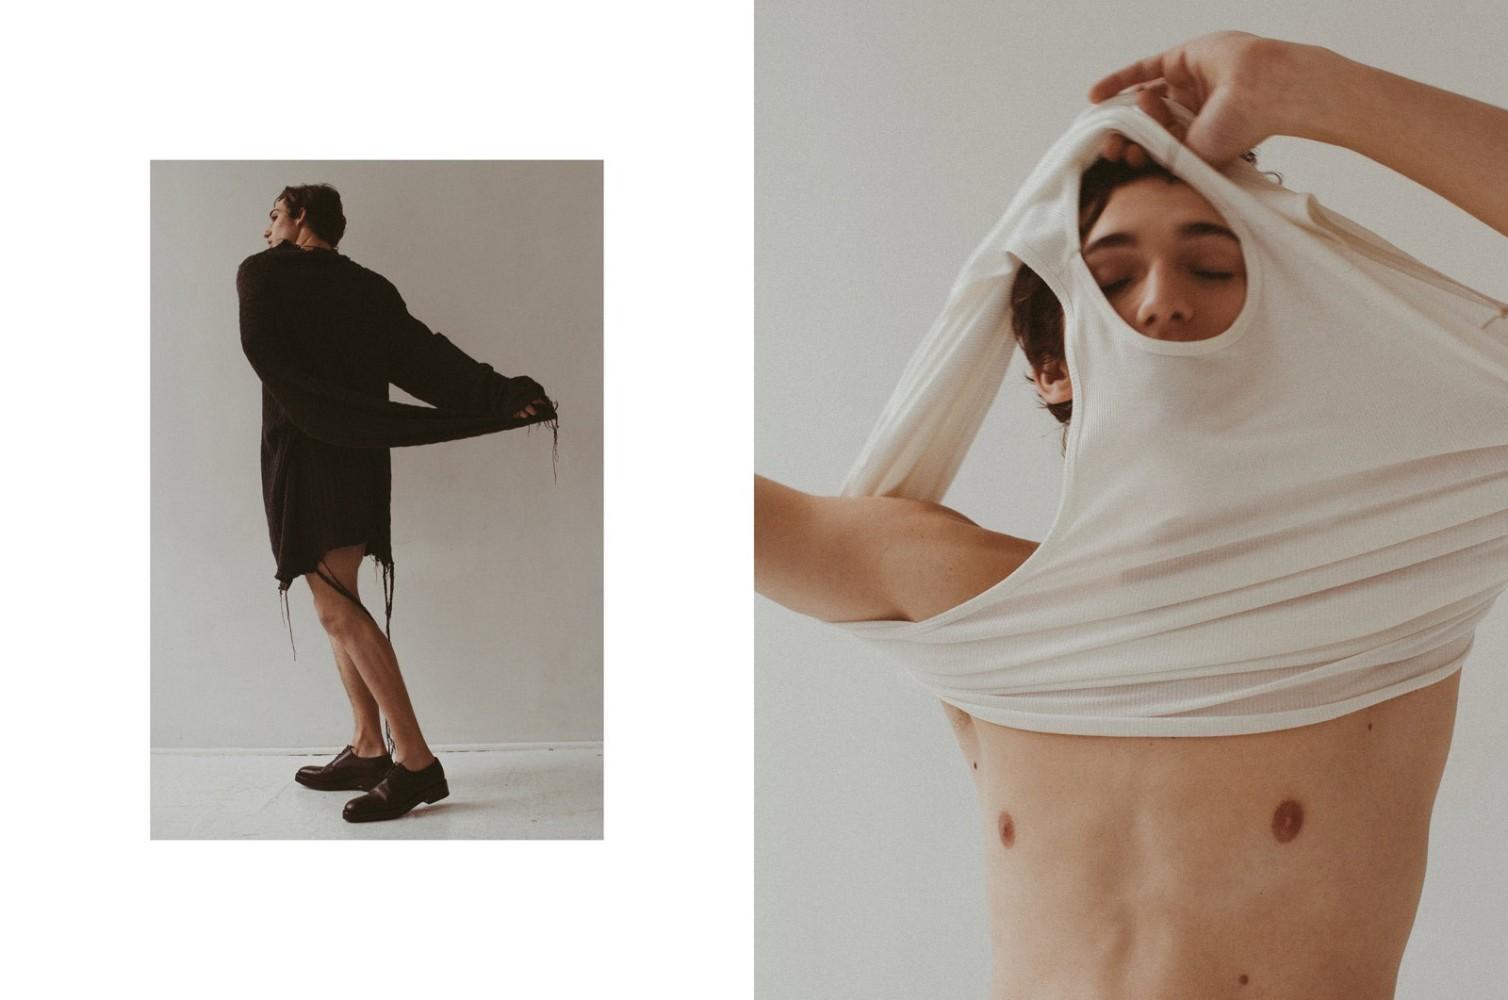 Quintin Van Konkelenberg model of the week